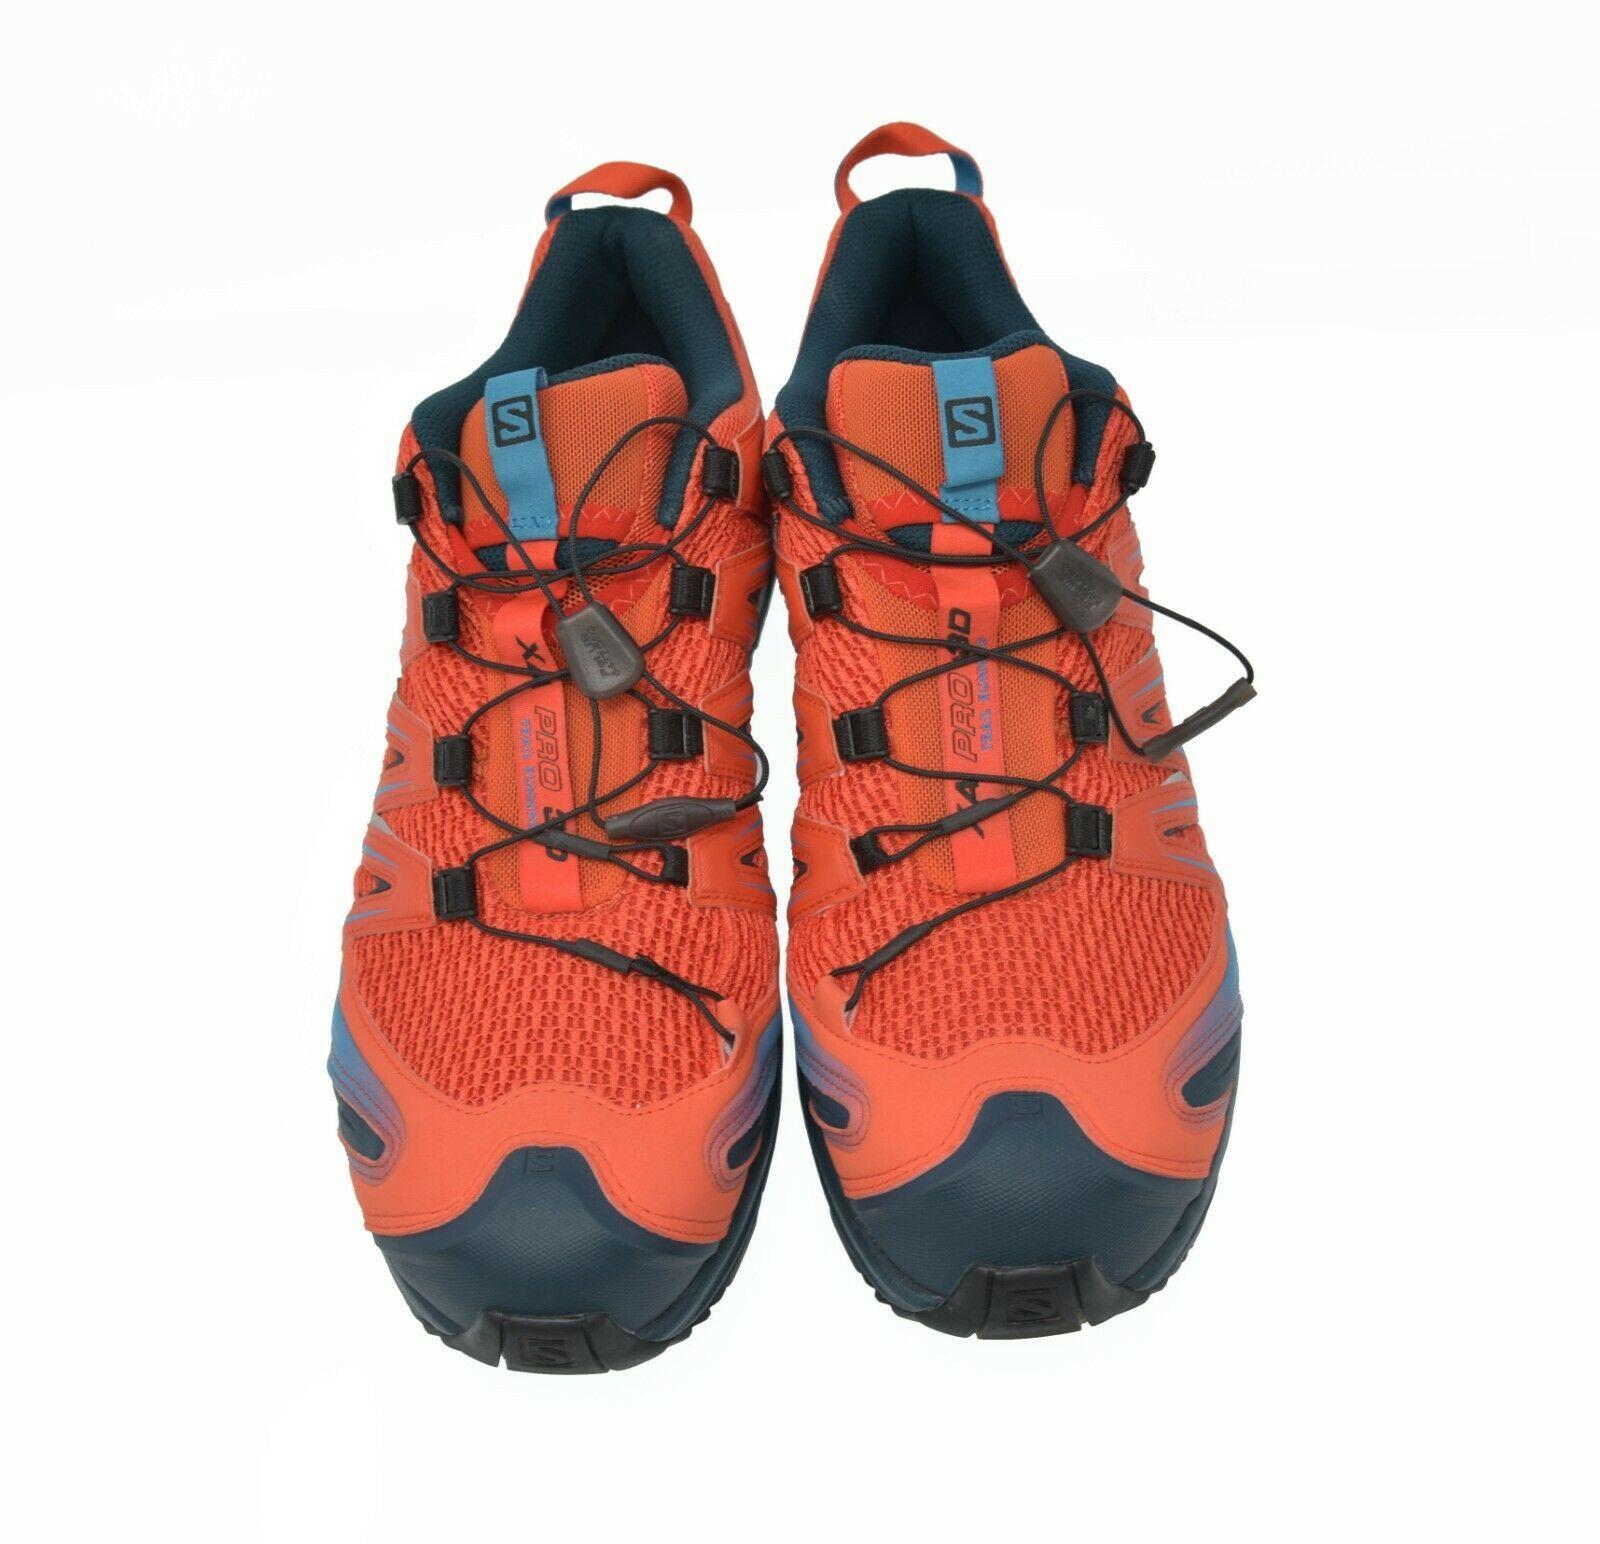 Solomon XA PRO 3D Trail Running Men's Sz 12.5 EU 47.5 Hiking Trail Sports Shoes image 4